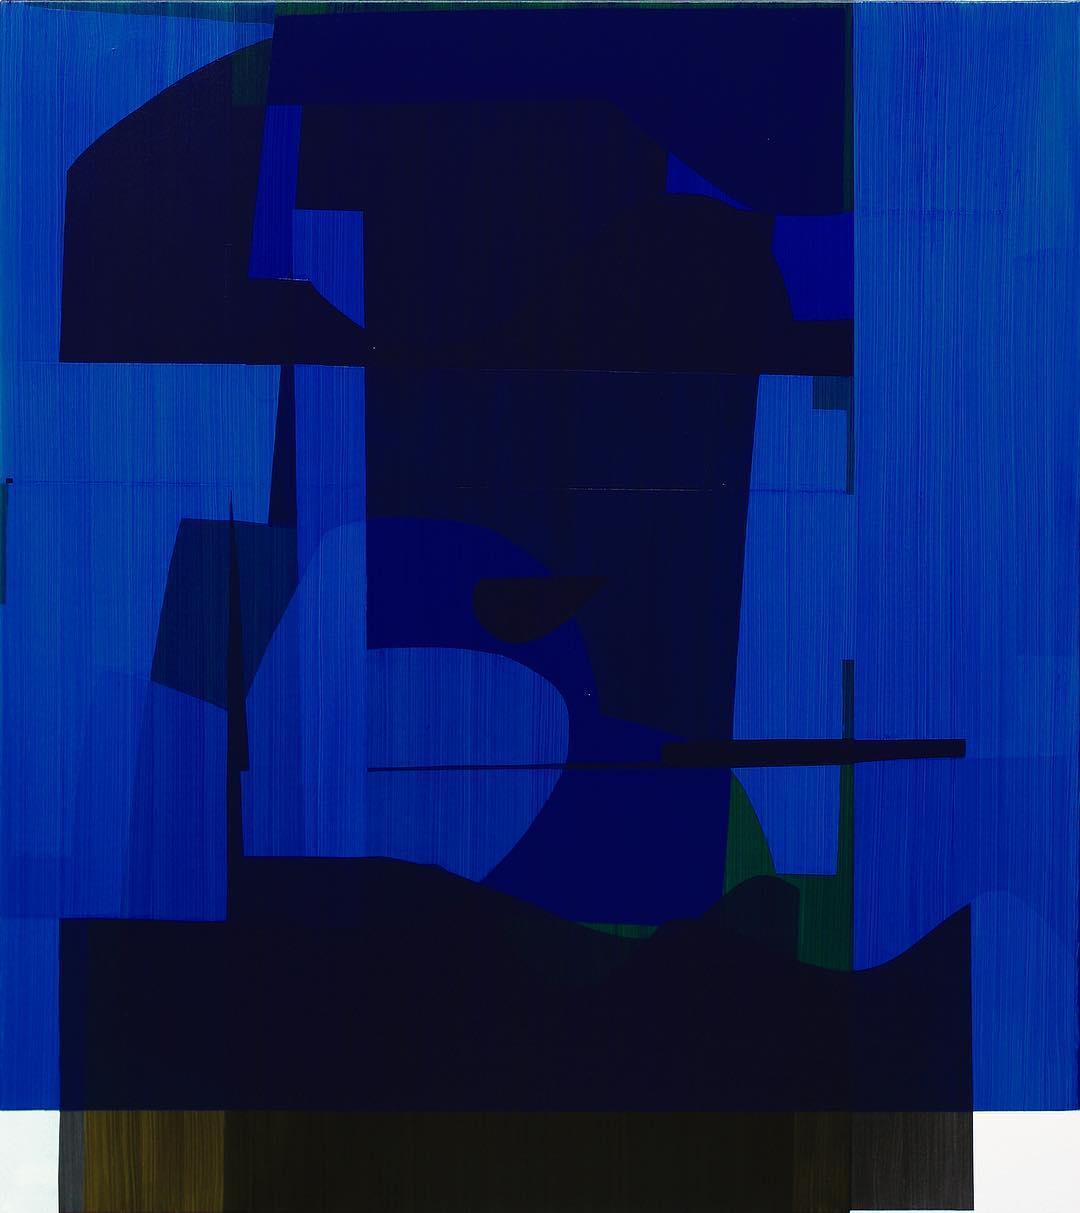 Simon Degroot,Overlay Blue, 2018,oil on canvas, 138 x 123cm.